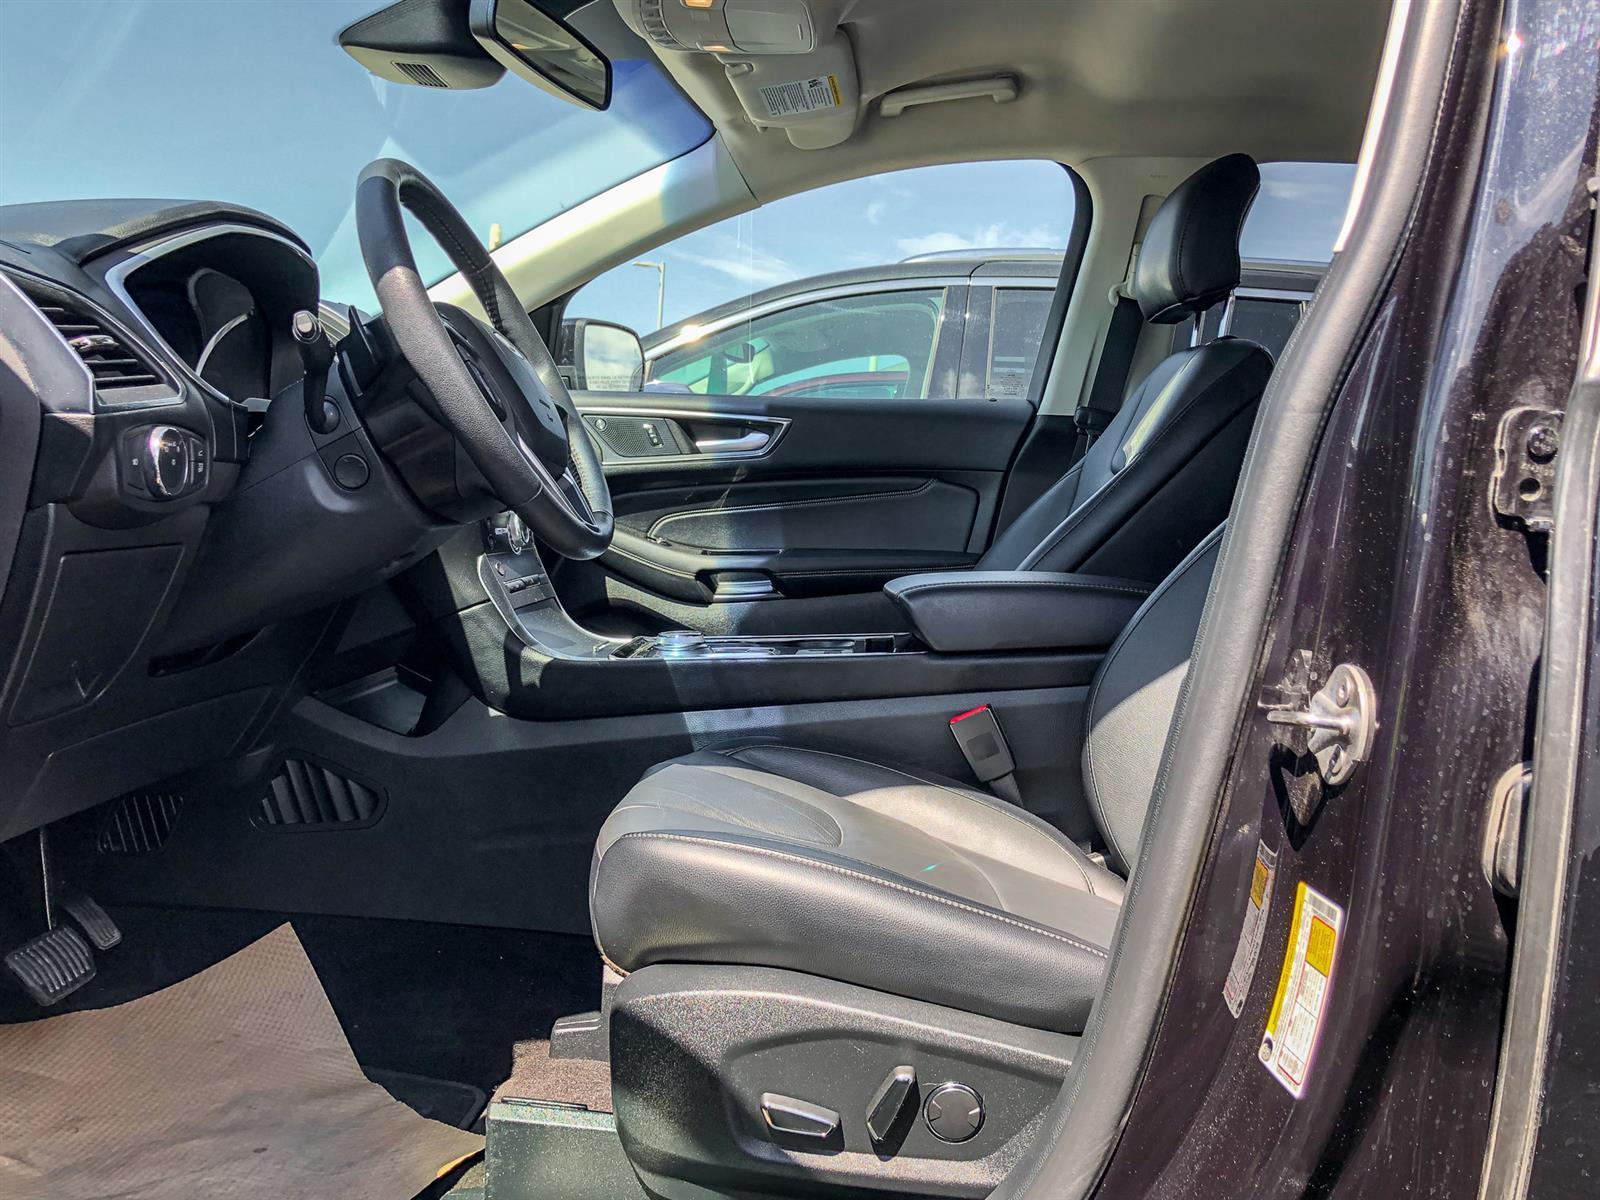 2019 Ford Edge TITANIUM | 2.0L ECOBOOST | AWD | REVERSE CAMERA | LANE-KEEP SYST